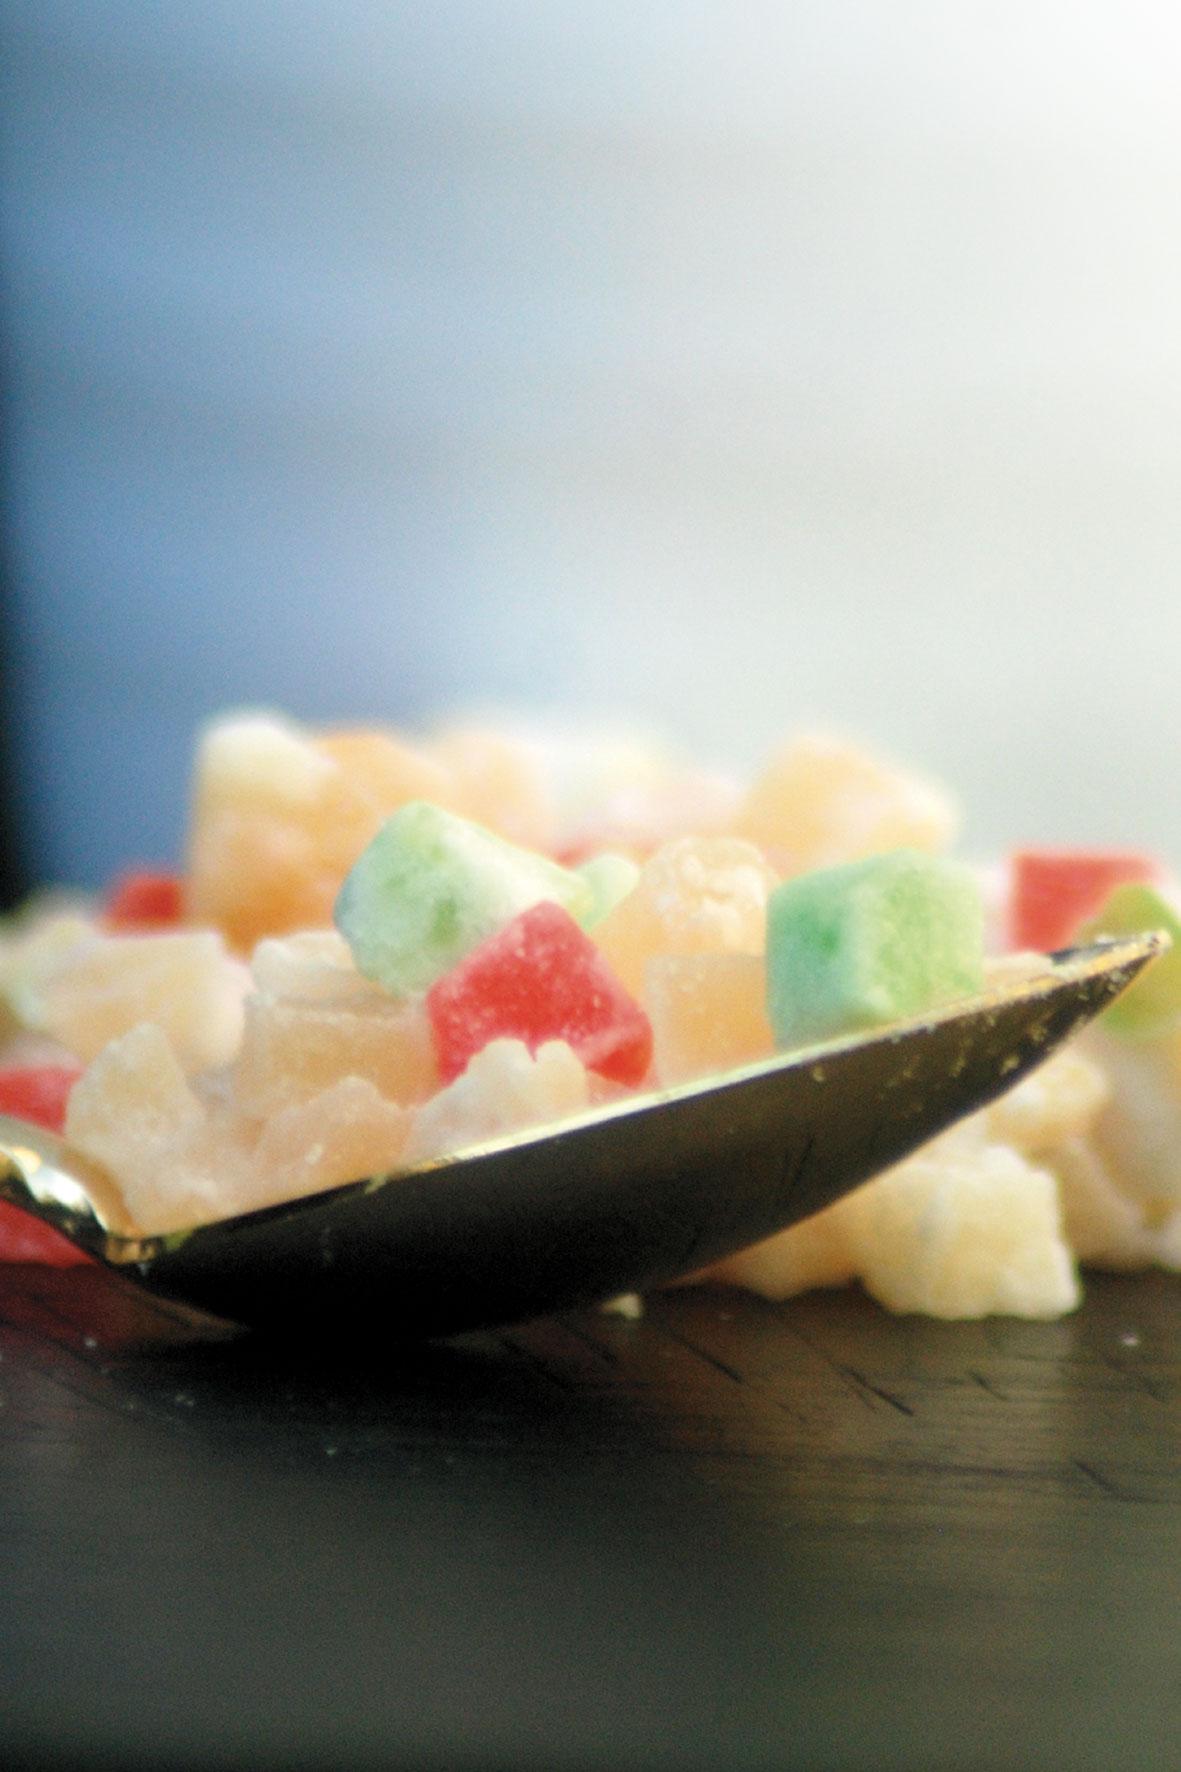 Pépites de fruits déshydratés fruit